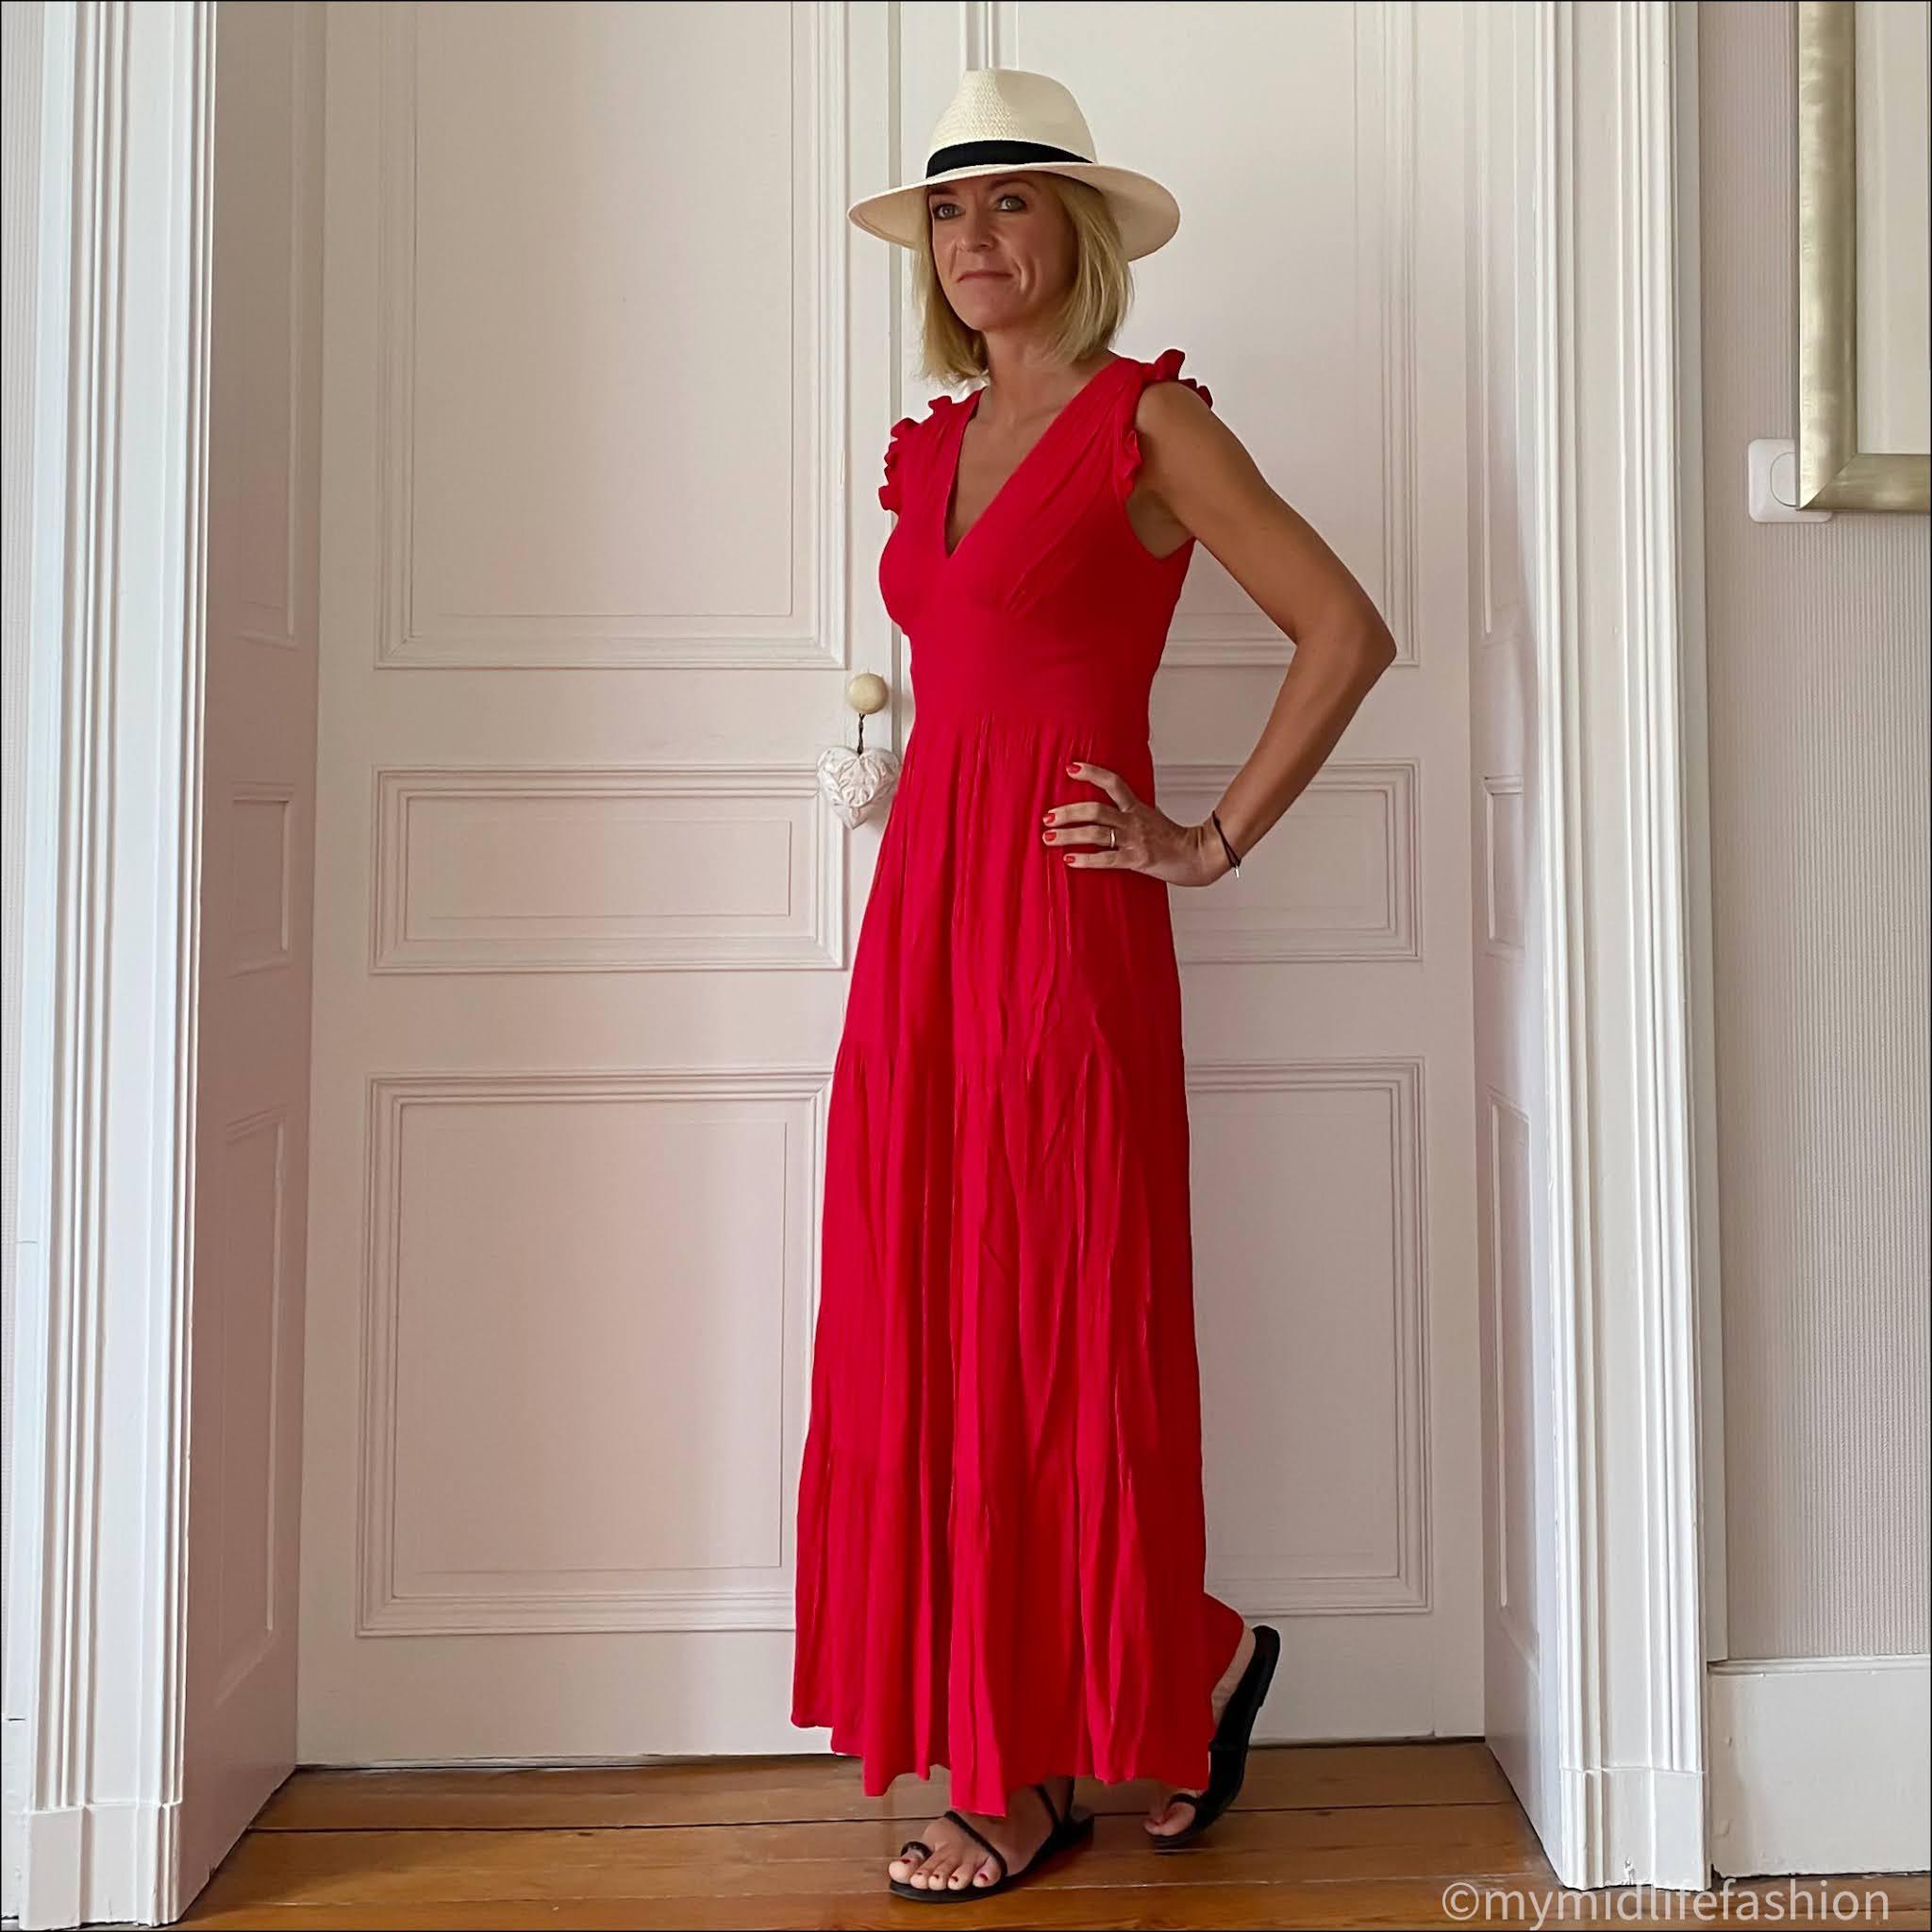 my midlife fashion, Goa maxi dress, Zara Panama hat, Ancient Greek black eleftheria braided leather sandals